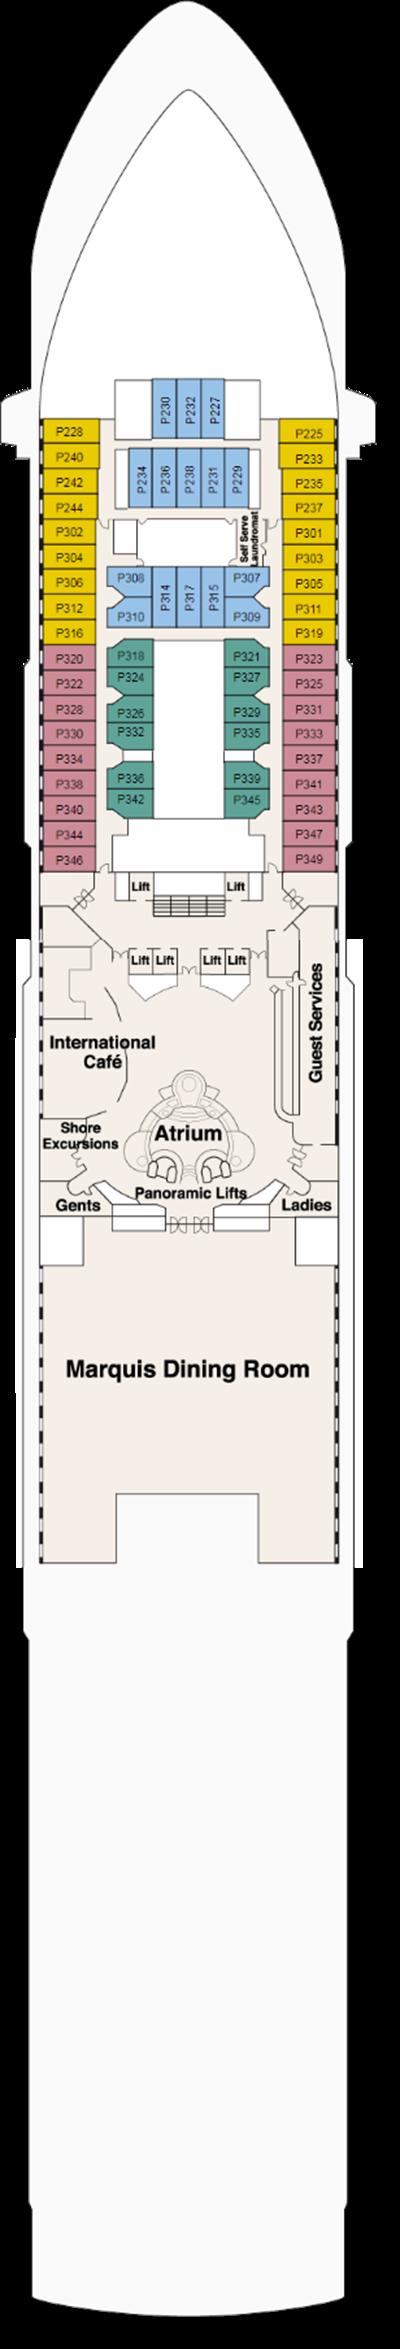 Plaza (Deck 5)